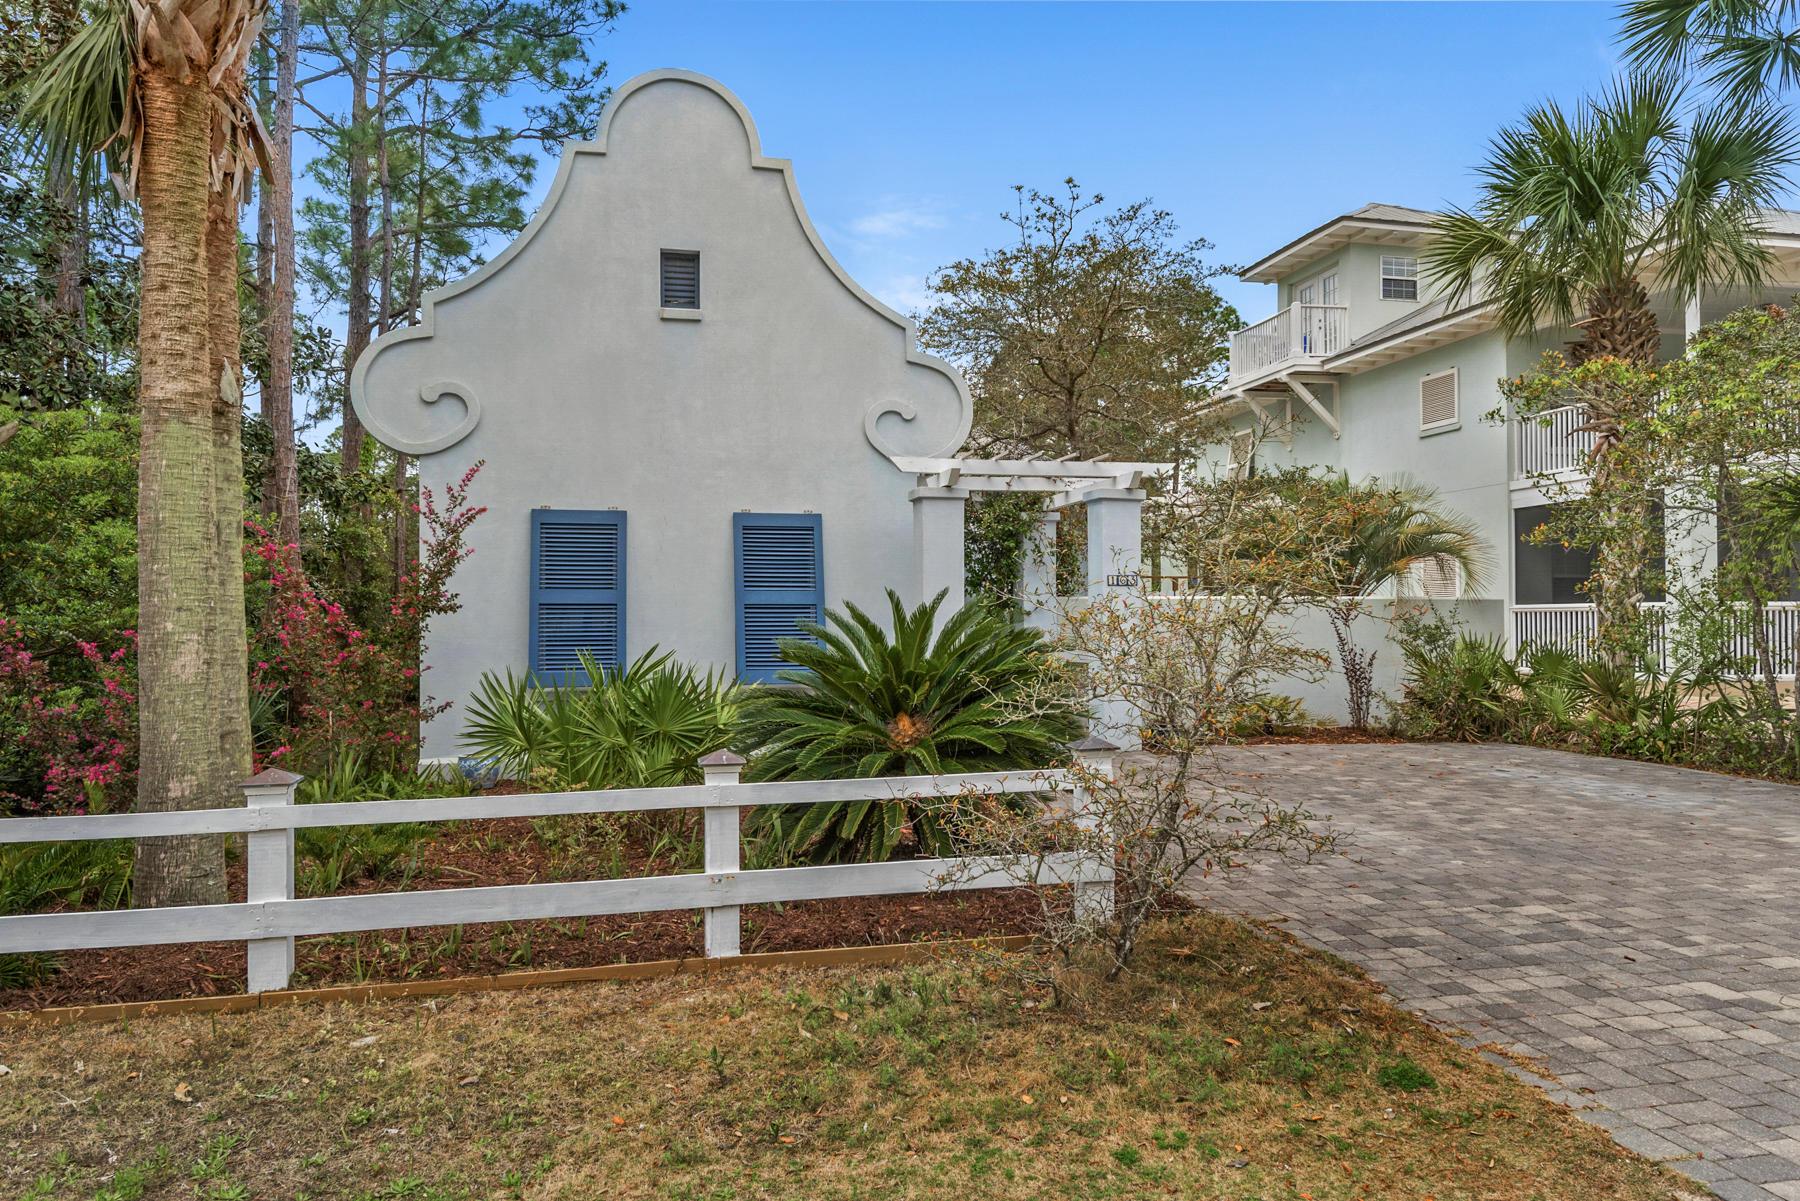 Photo of home for sale at 163 San Juan, Santa Rosa Beach FL